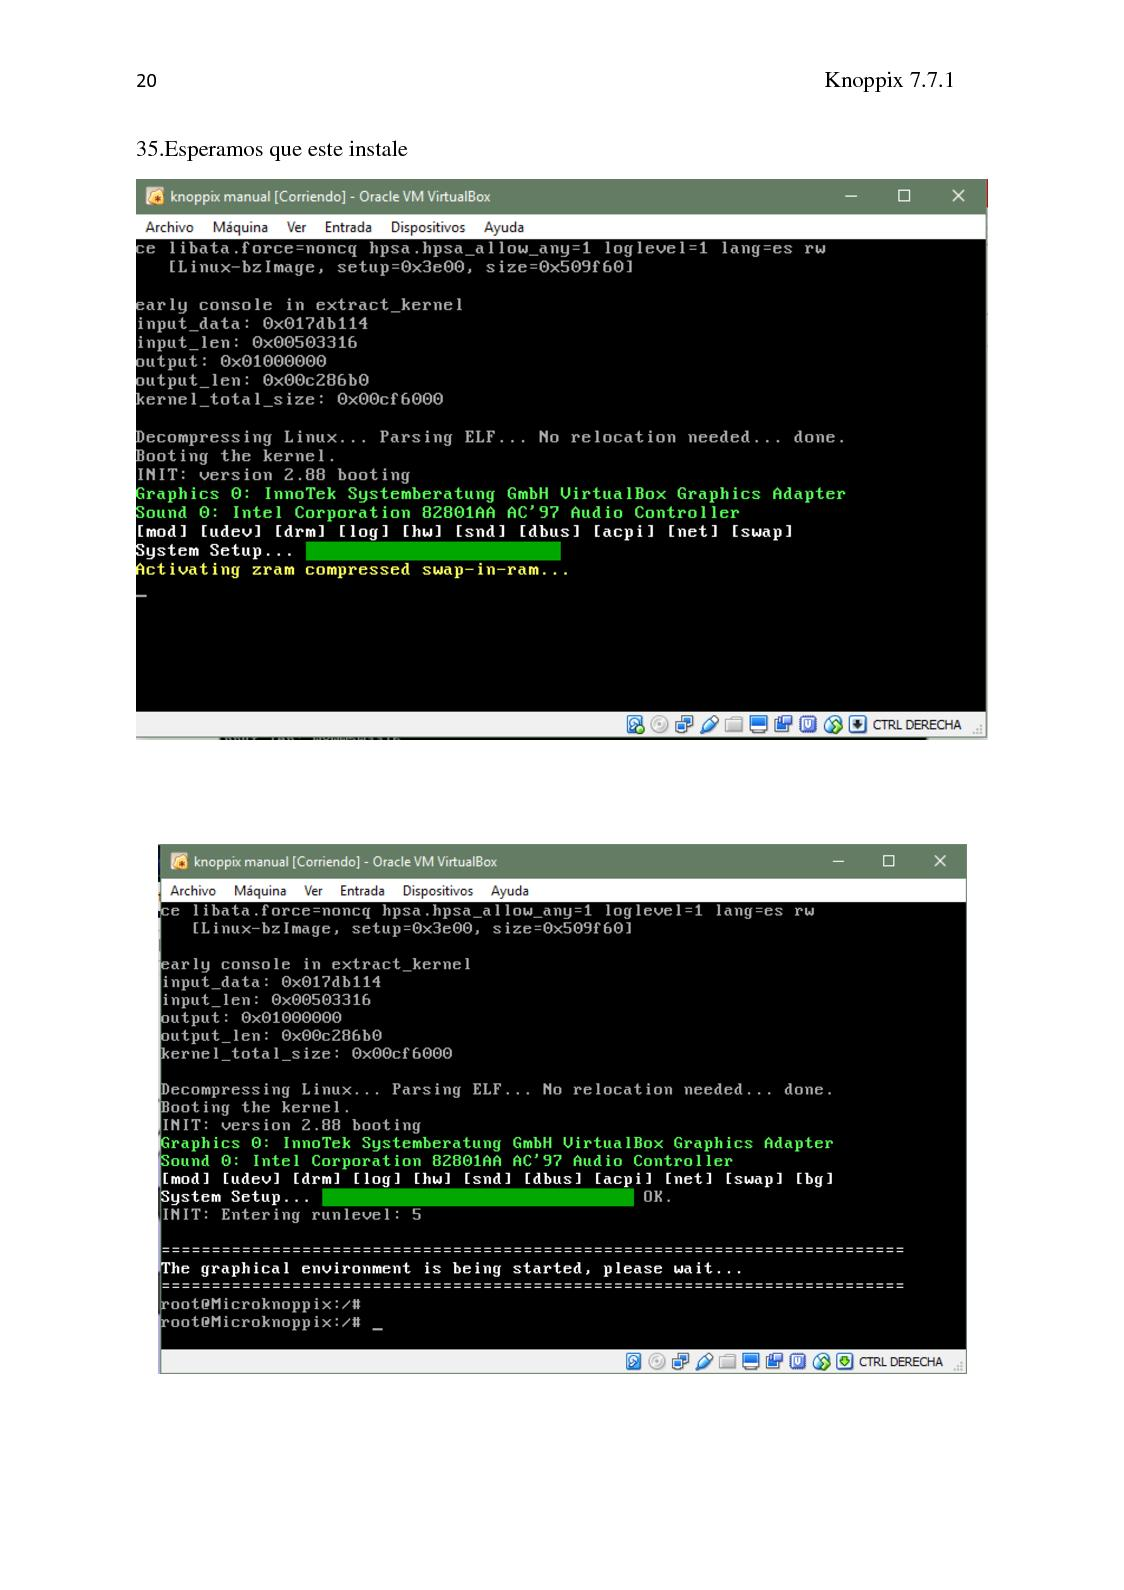 Manual De Instalacion De Knoppix En El Virtual Box - CALAMEO